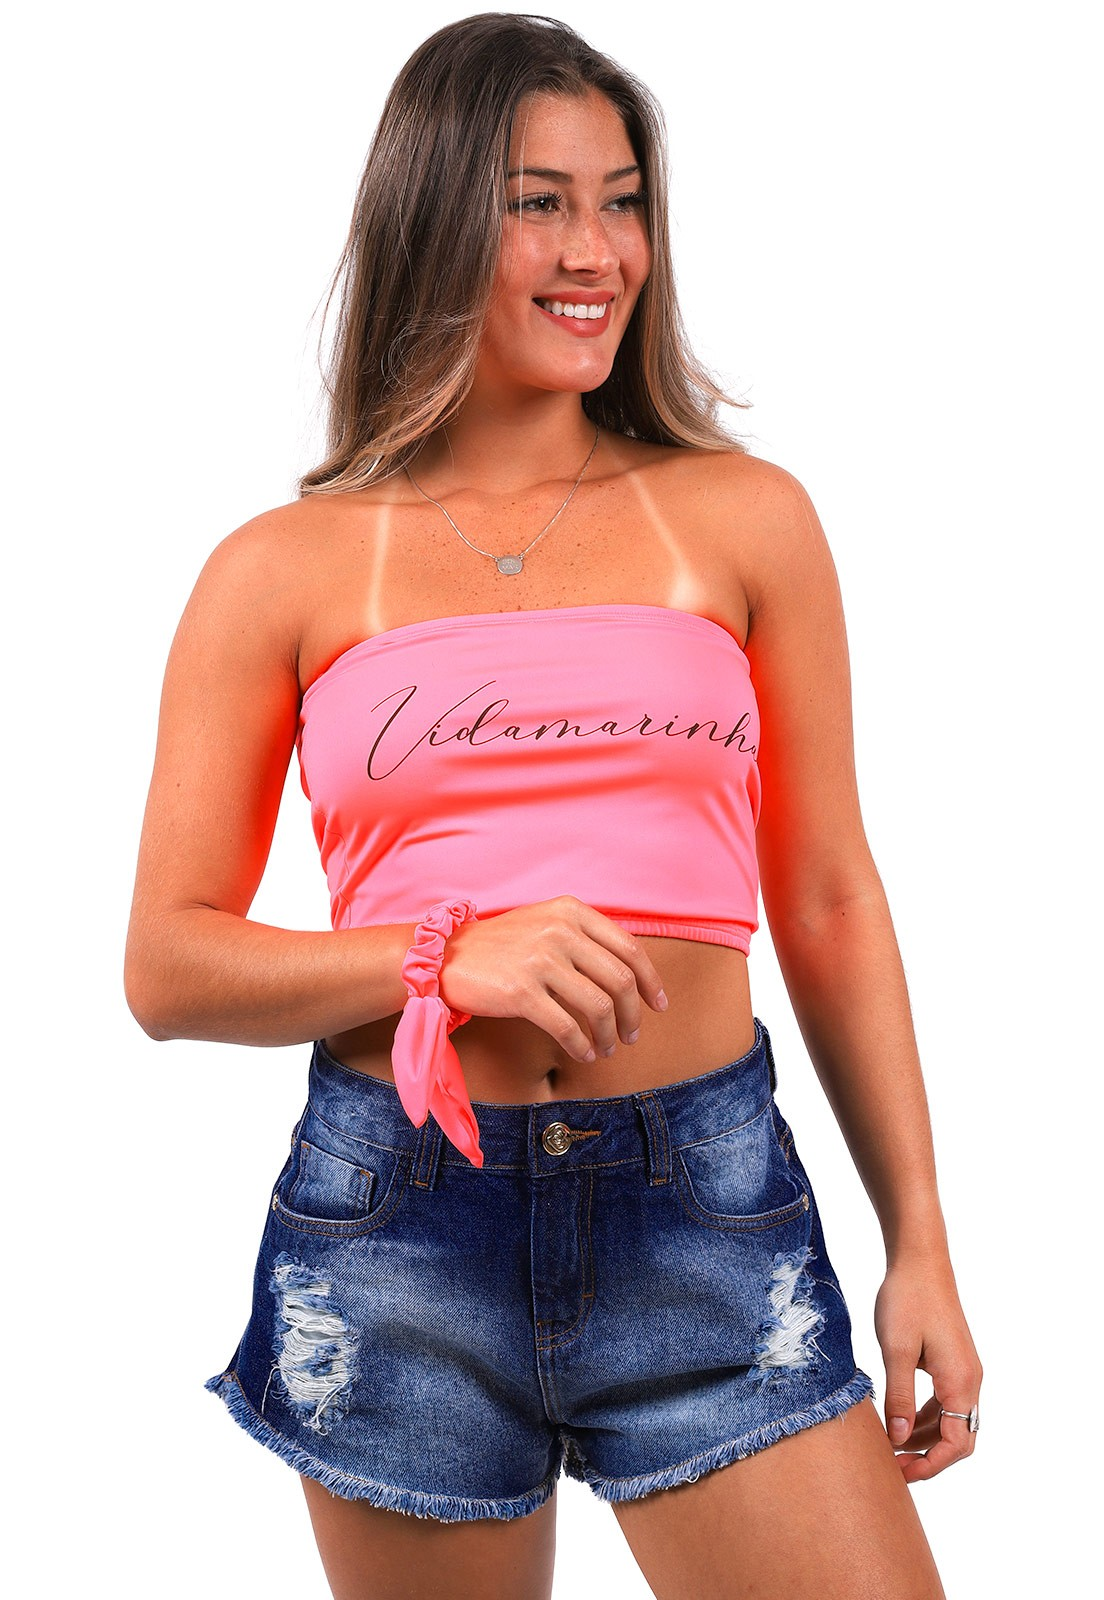 Top Faixa Vida Marinha Rosa Neon + Scrunchie